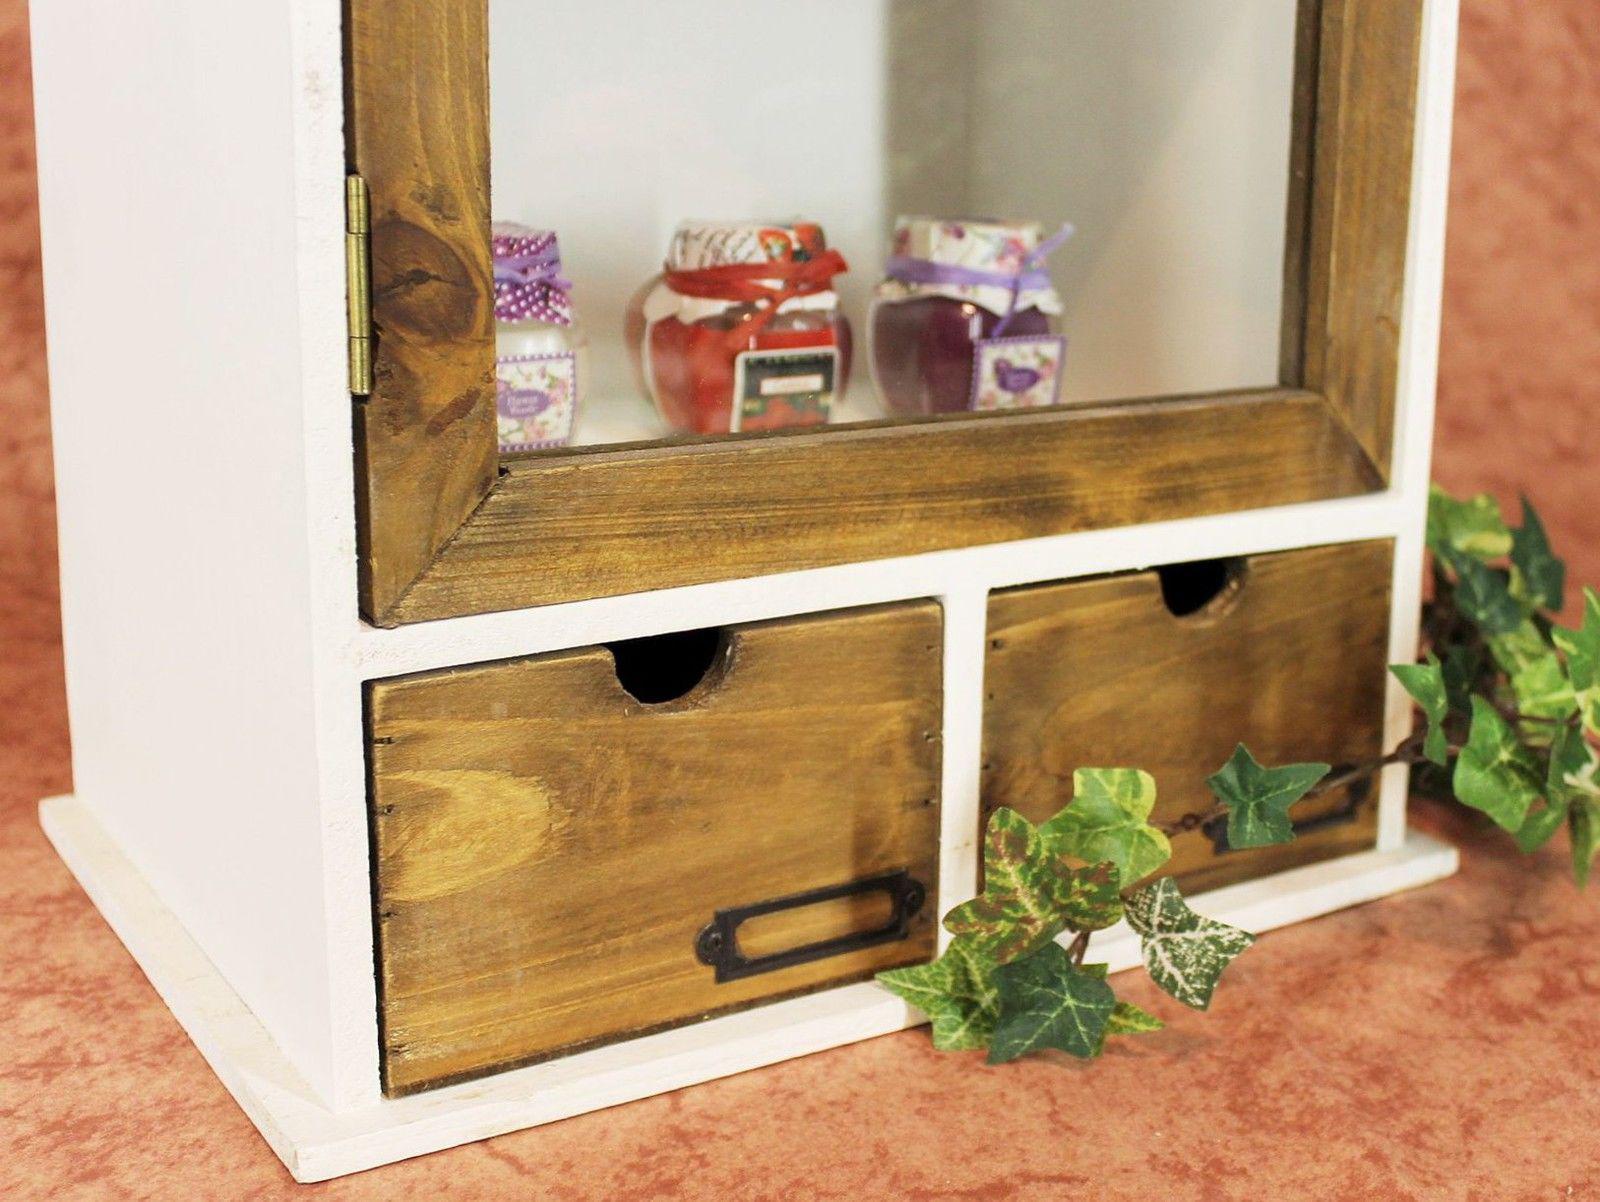 schrank minivitrine 12024 k chenschrank regal 50 cm shabby. Black Bedroom Furniture Sets. Home Design Ideas